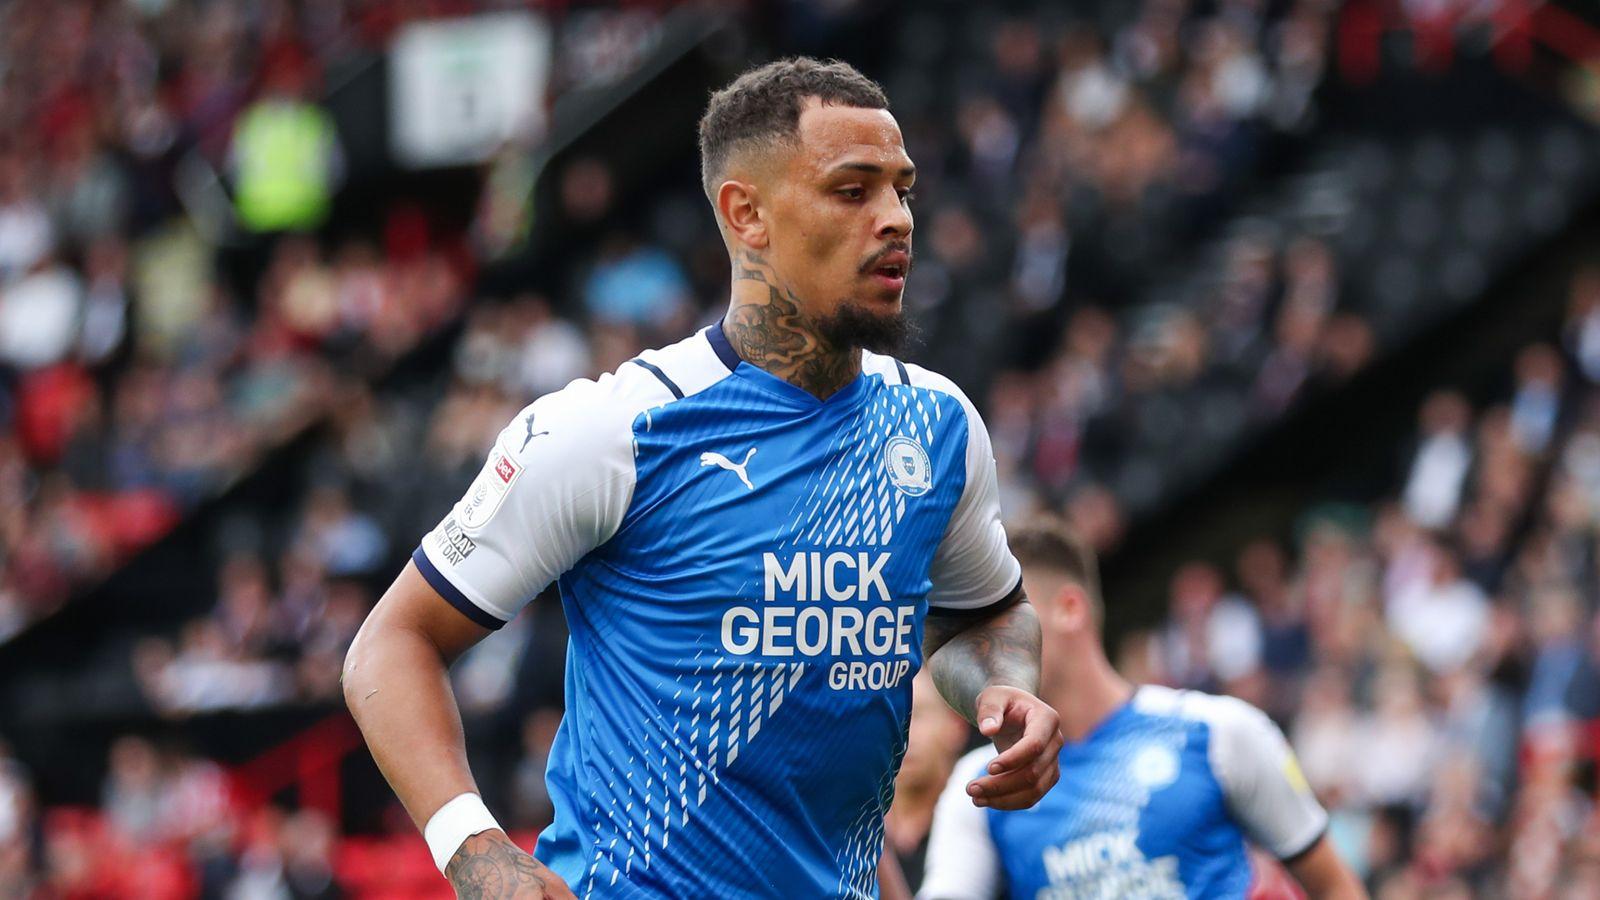 Jonson Clarke-Harris: Peterborough striker handed four-match ban, fined £5,300 for historical social media posts